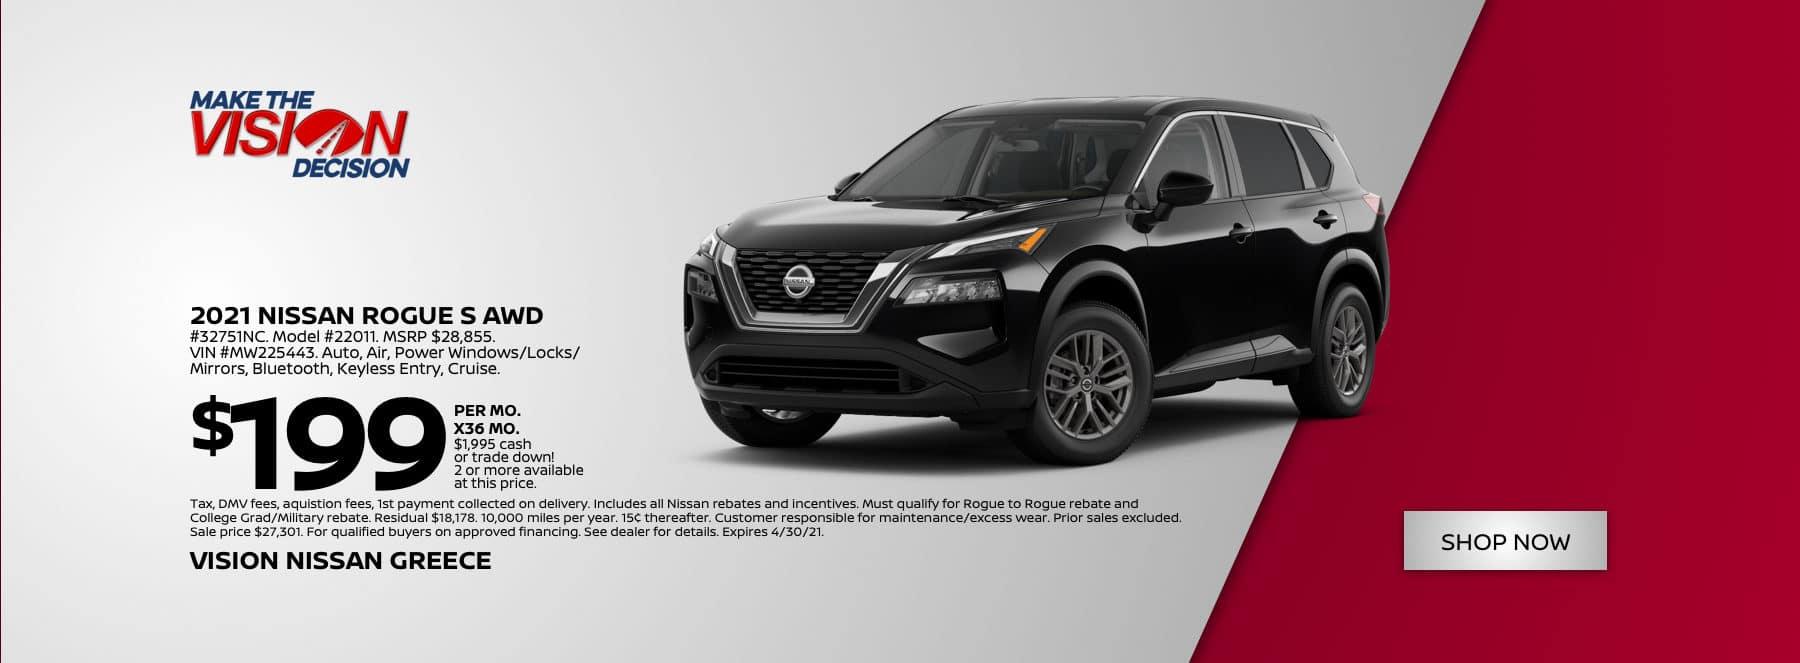 Vision-Nissan-Sliders-0305-Rogue-Greece